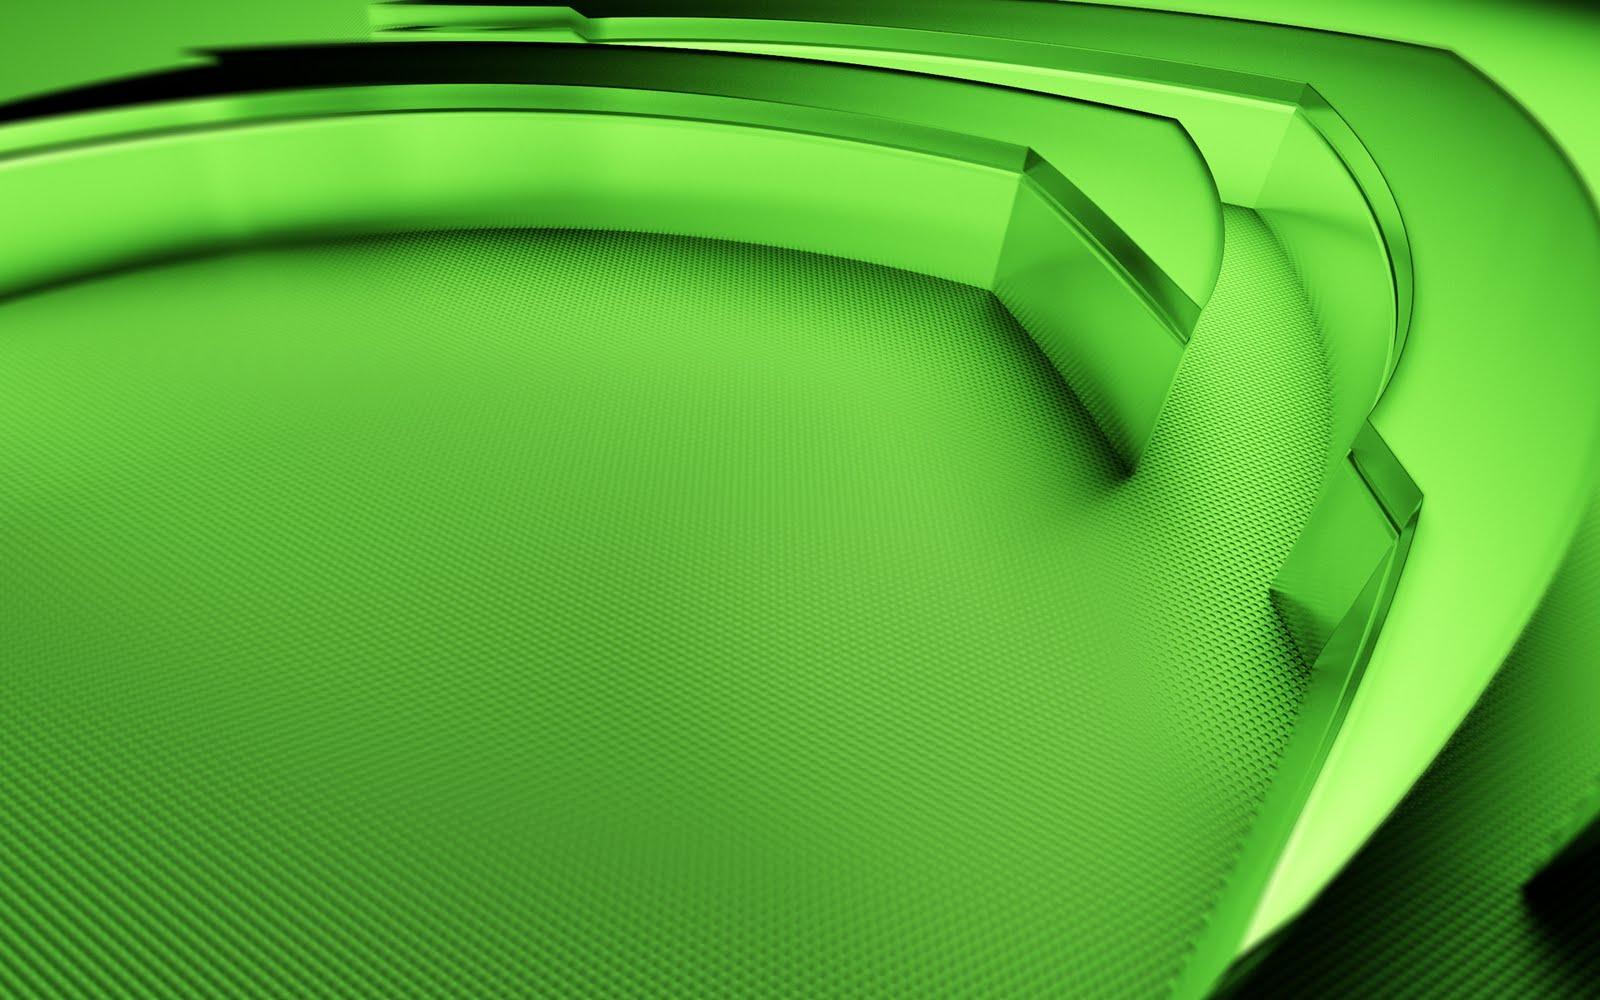 Nickname   nVidea 3D Green Logo Wallpaper Resolotion   1600x1000 1600x1000